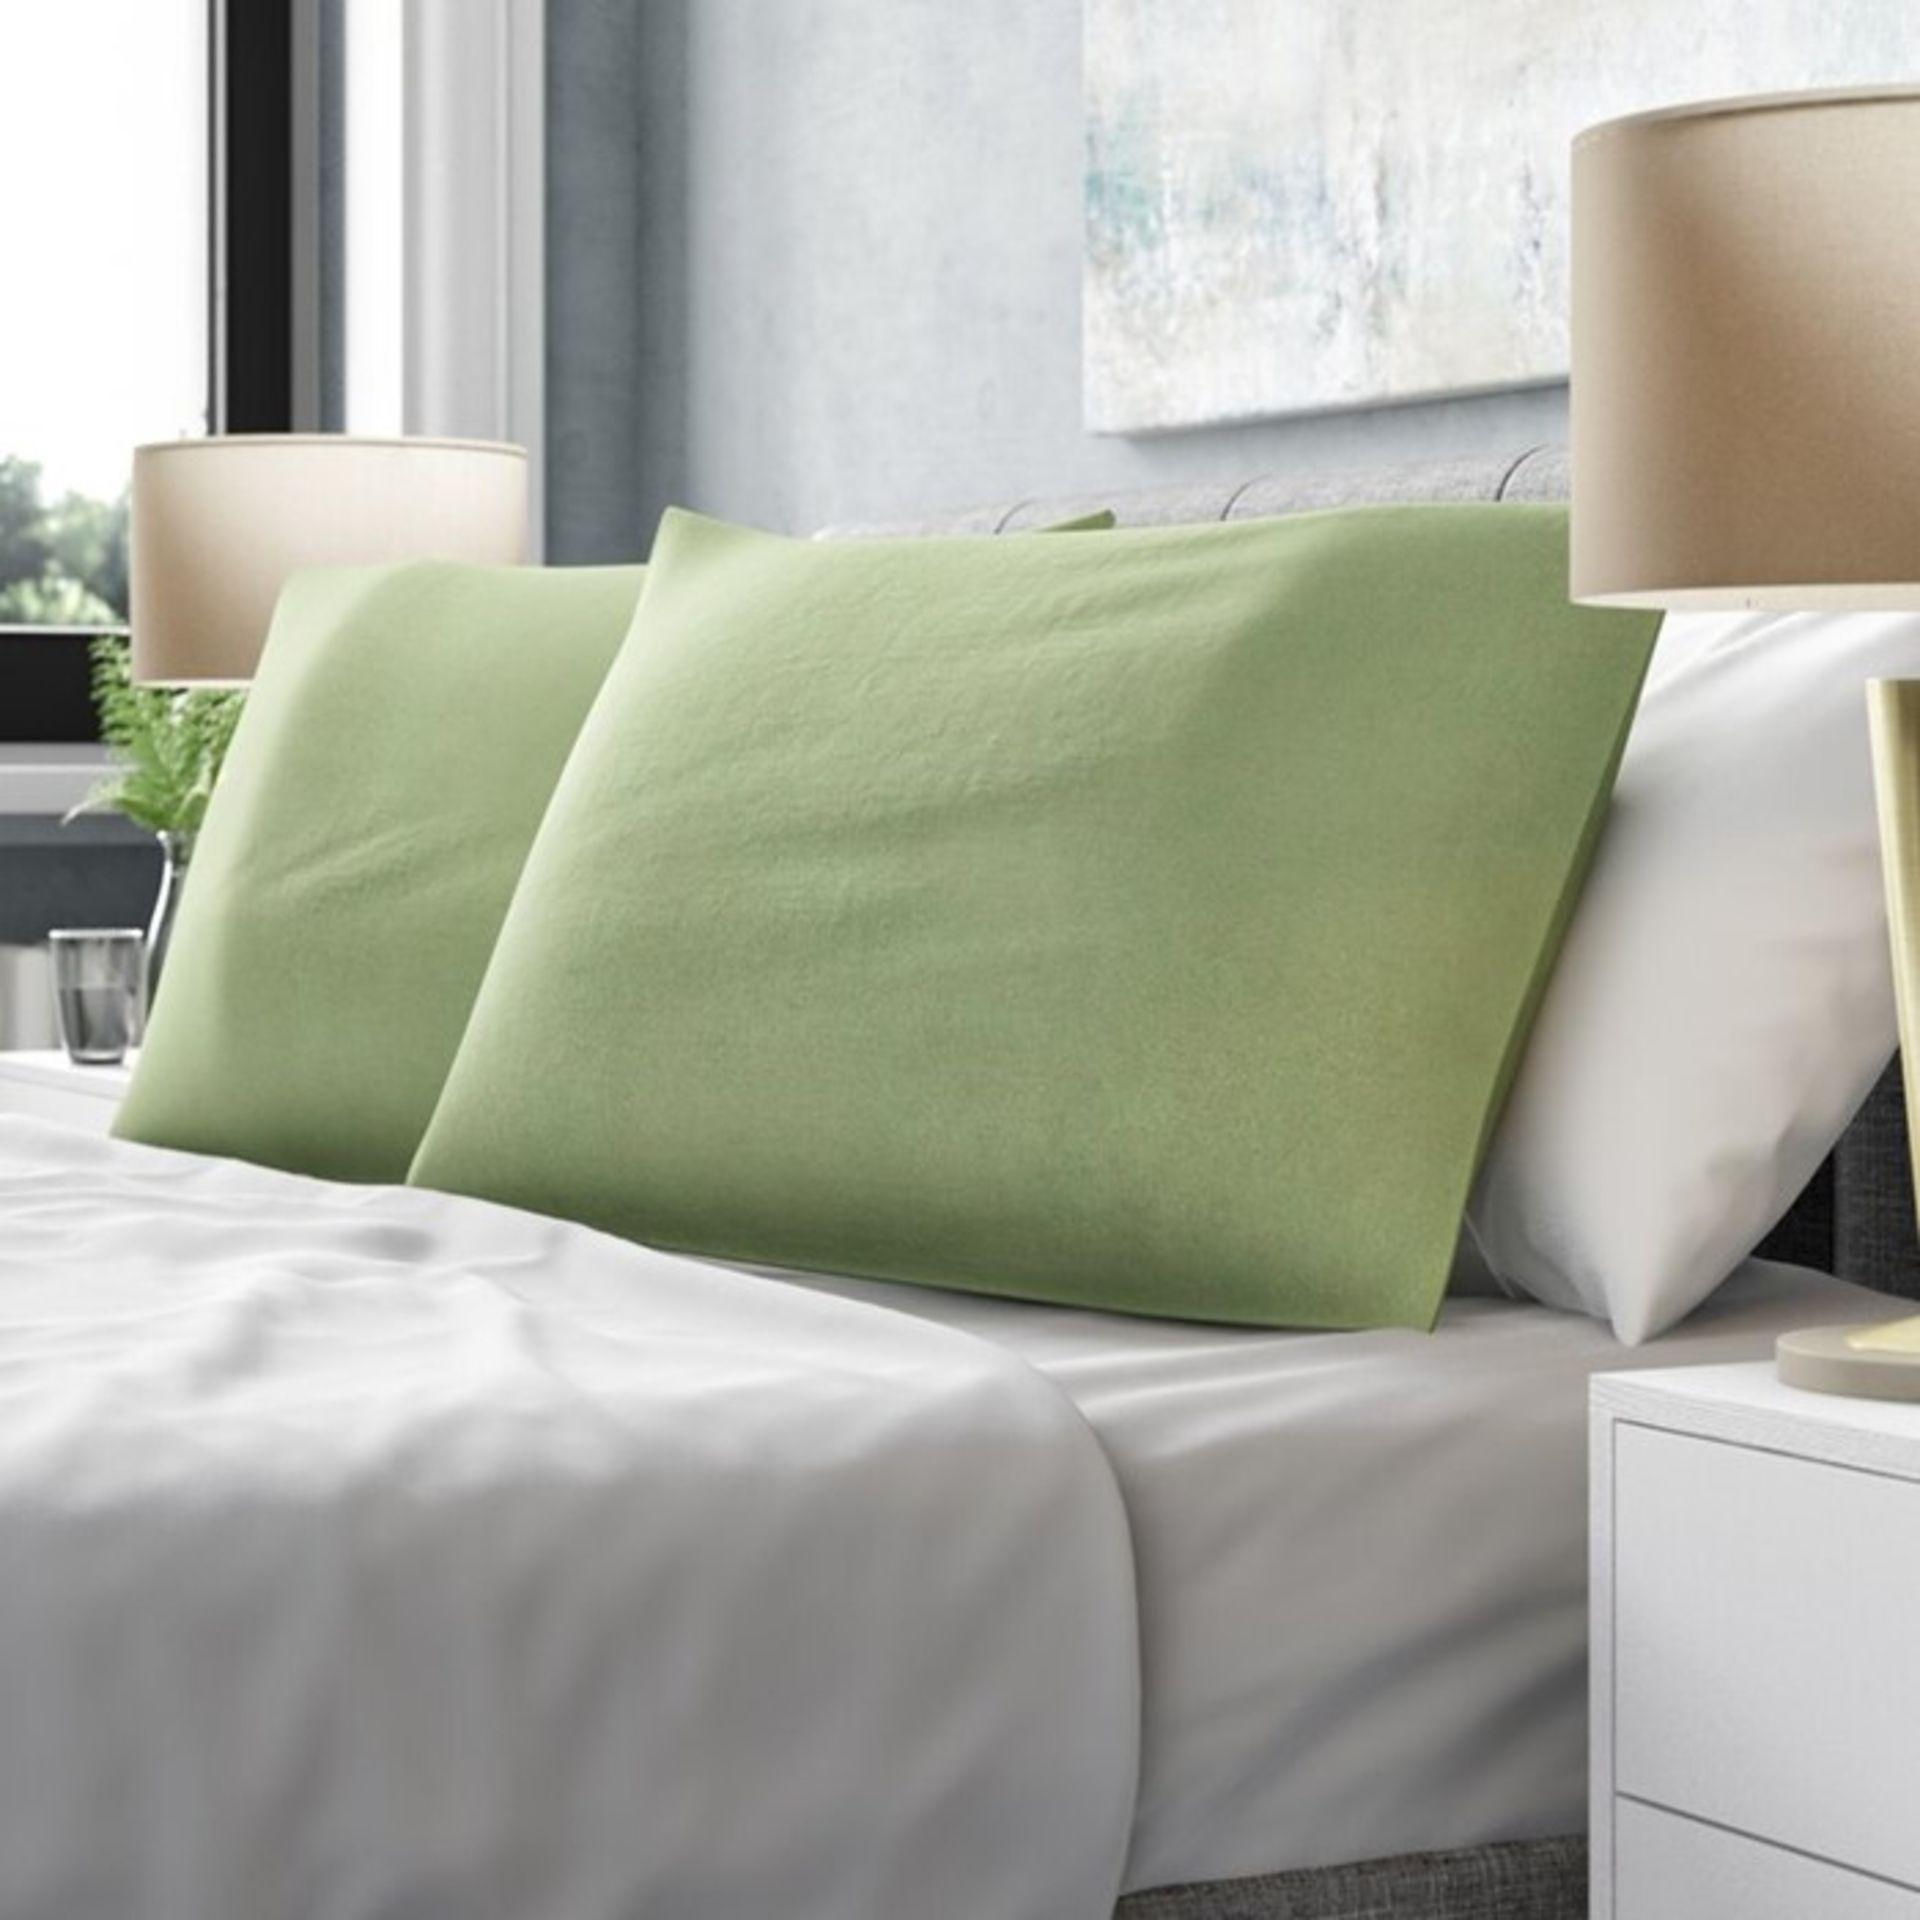 Symple Stuff, Housewife Pillowcase (SET OF 2 / APPLE) - RRP £9.98 (QVP2050.19353810 - HL9 - 5/80)